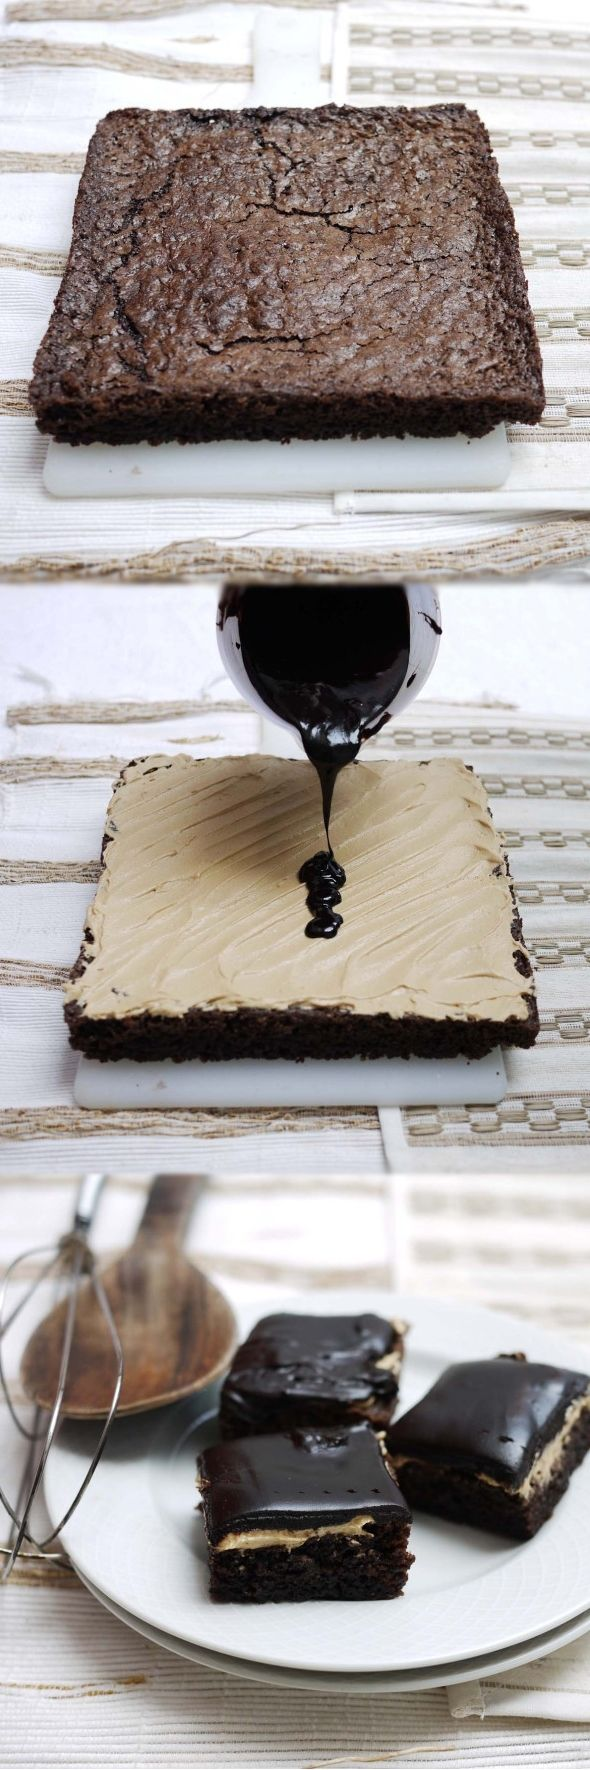 Entertaining Food Deserts Coffee Cream Brownies